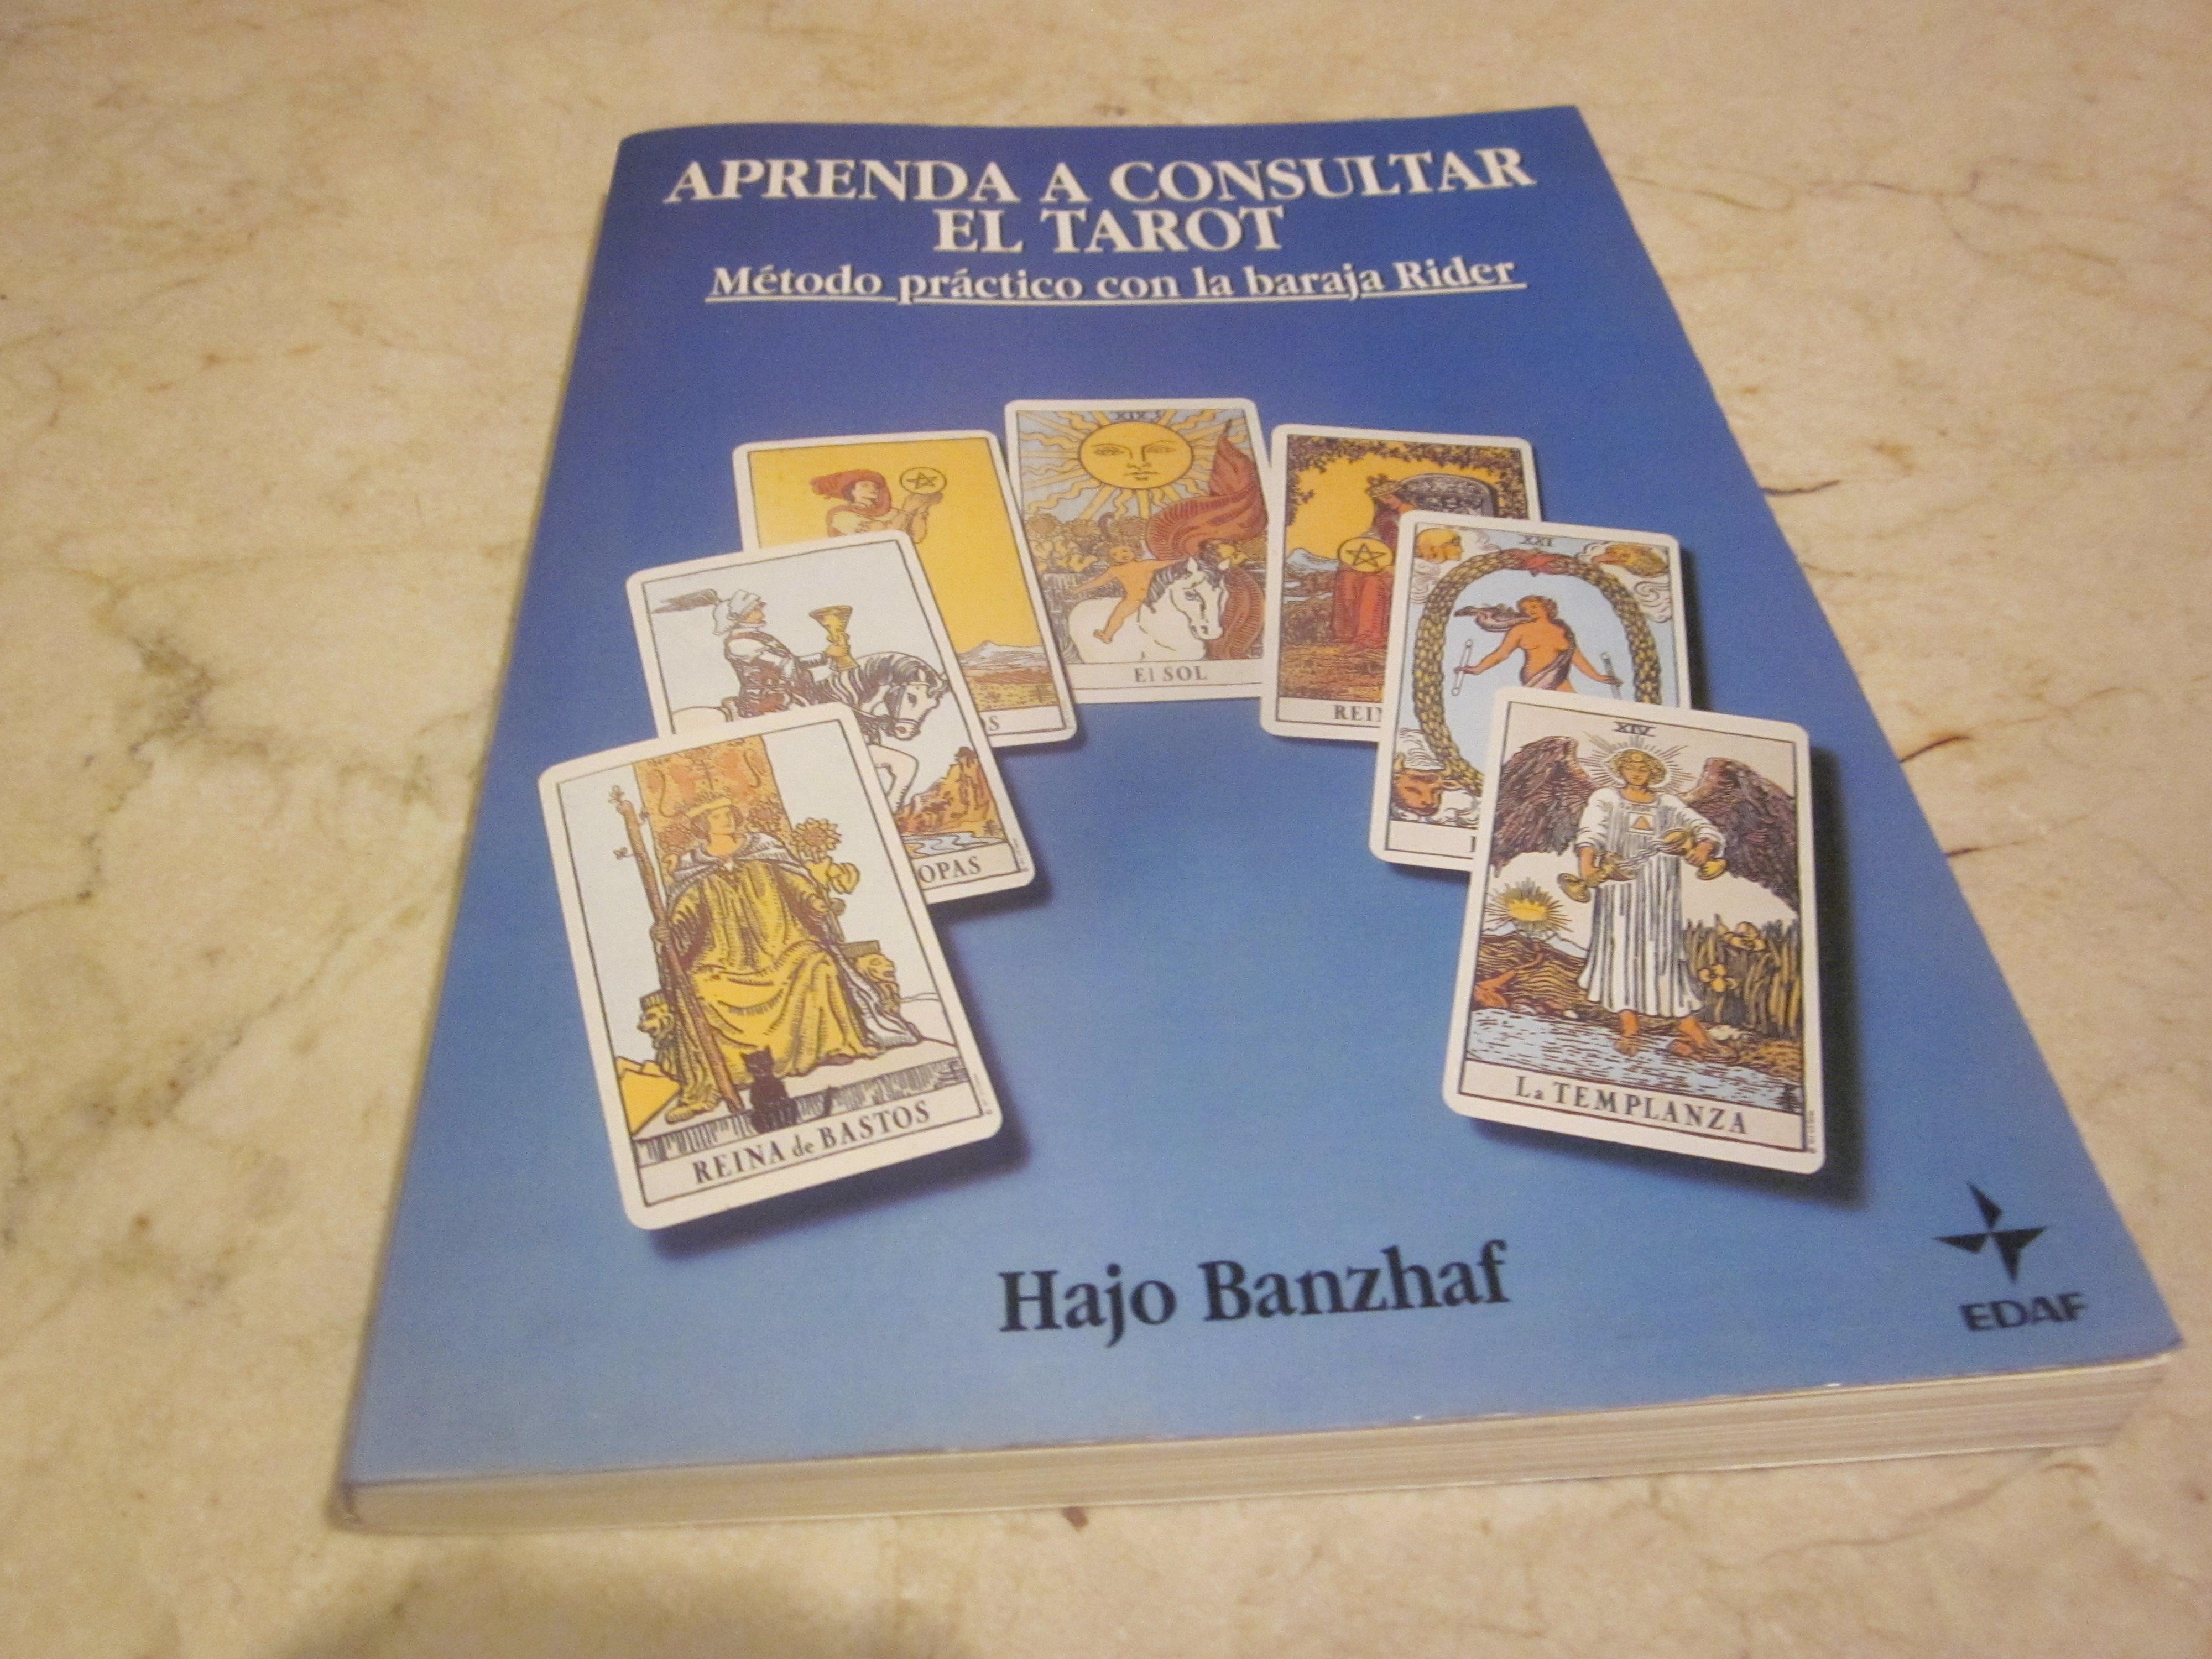 aprenda a consultar el tarot by hajo banzhaf paperback 1992 from marcos ottone and. Black Bedroom Furniture Sets. Home Design Ideas